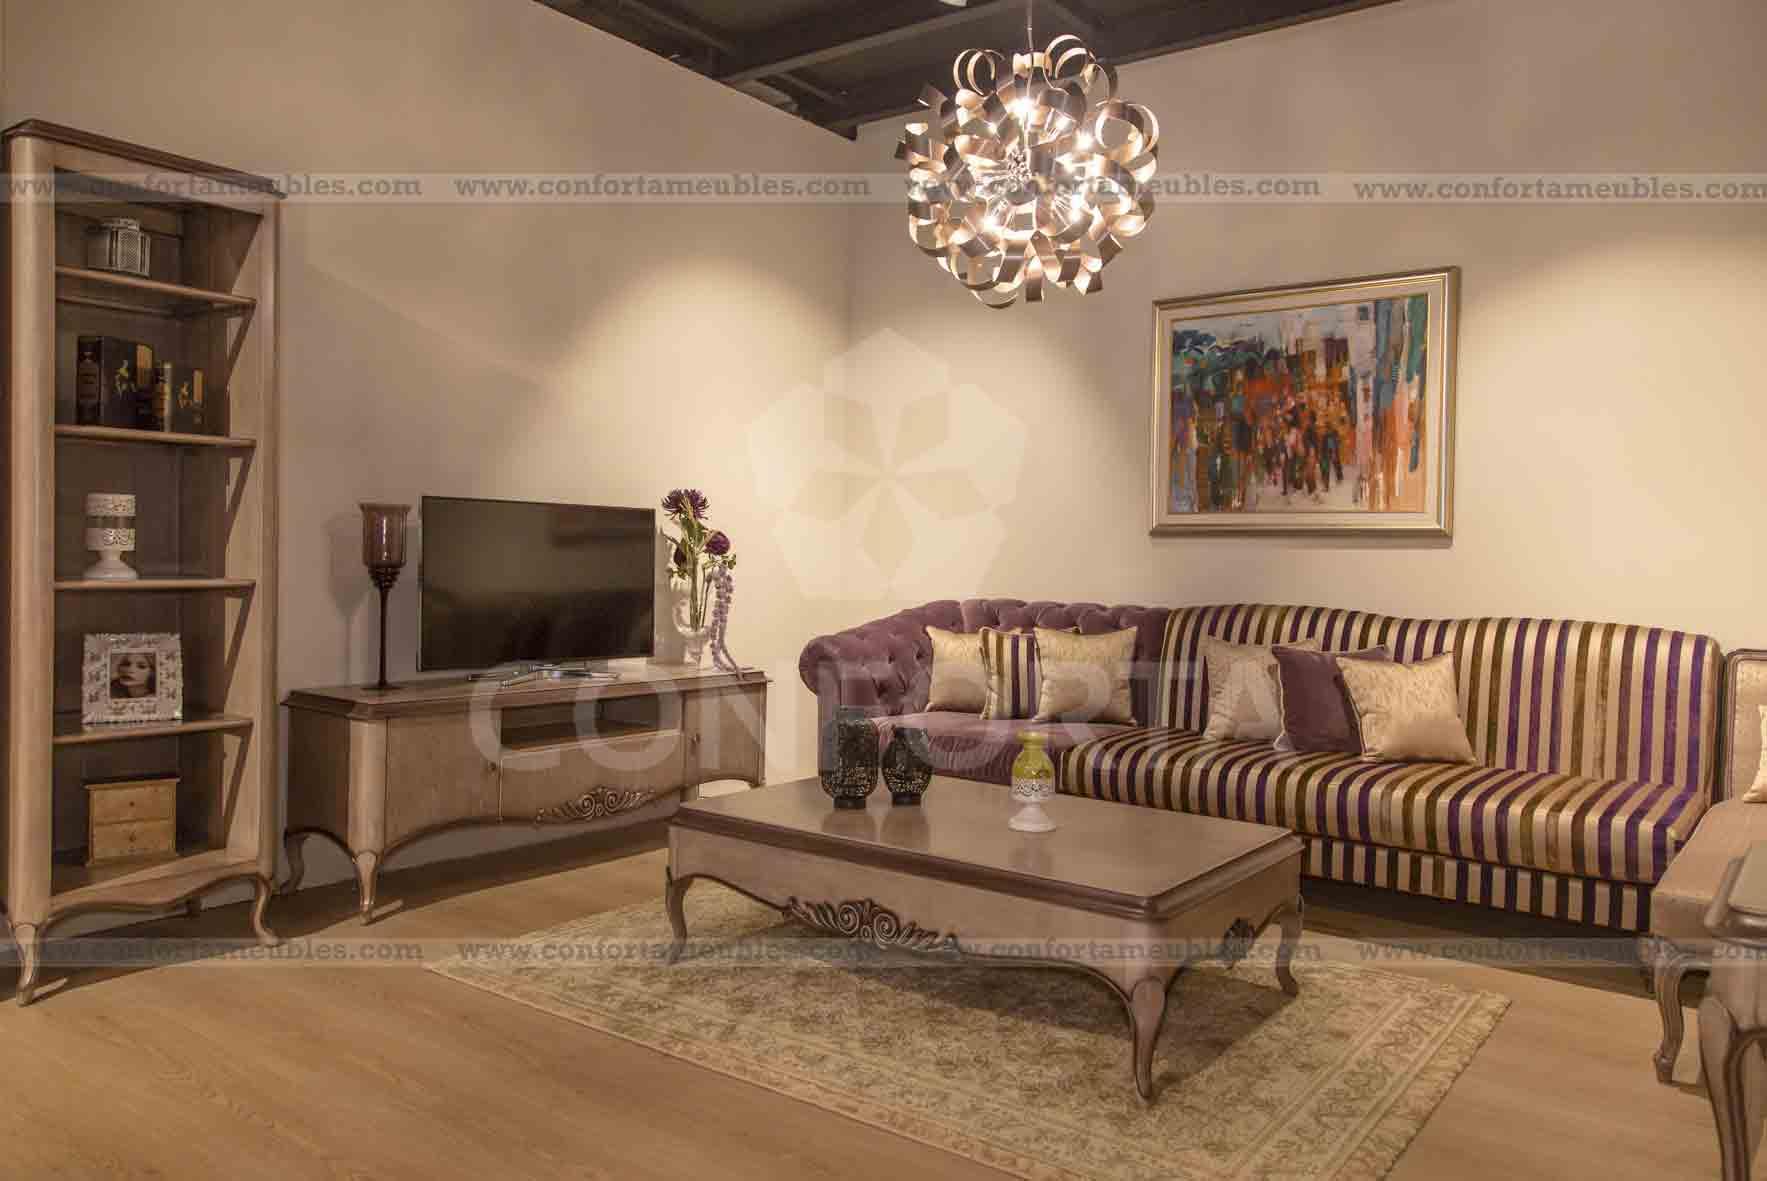 Meuble tv tunisie meubles et d coration tunisie for Meuble tv zebra